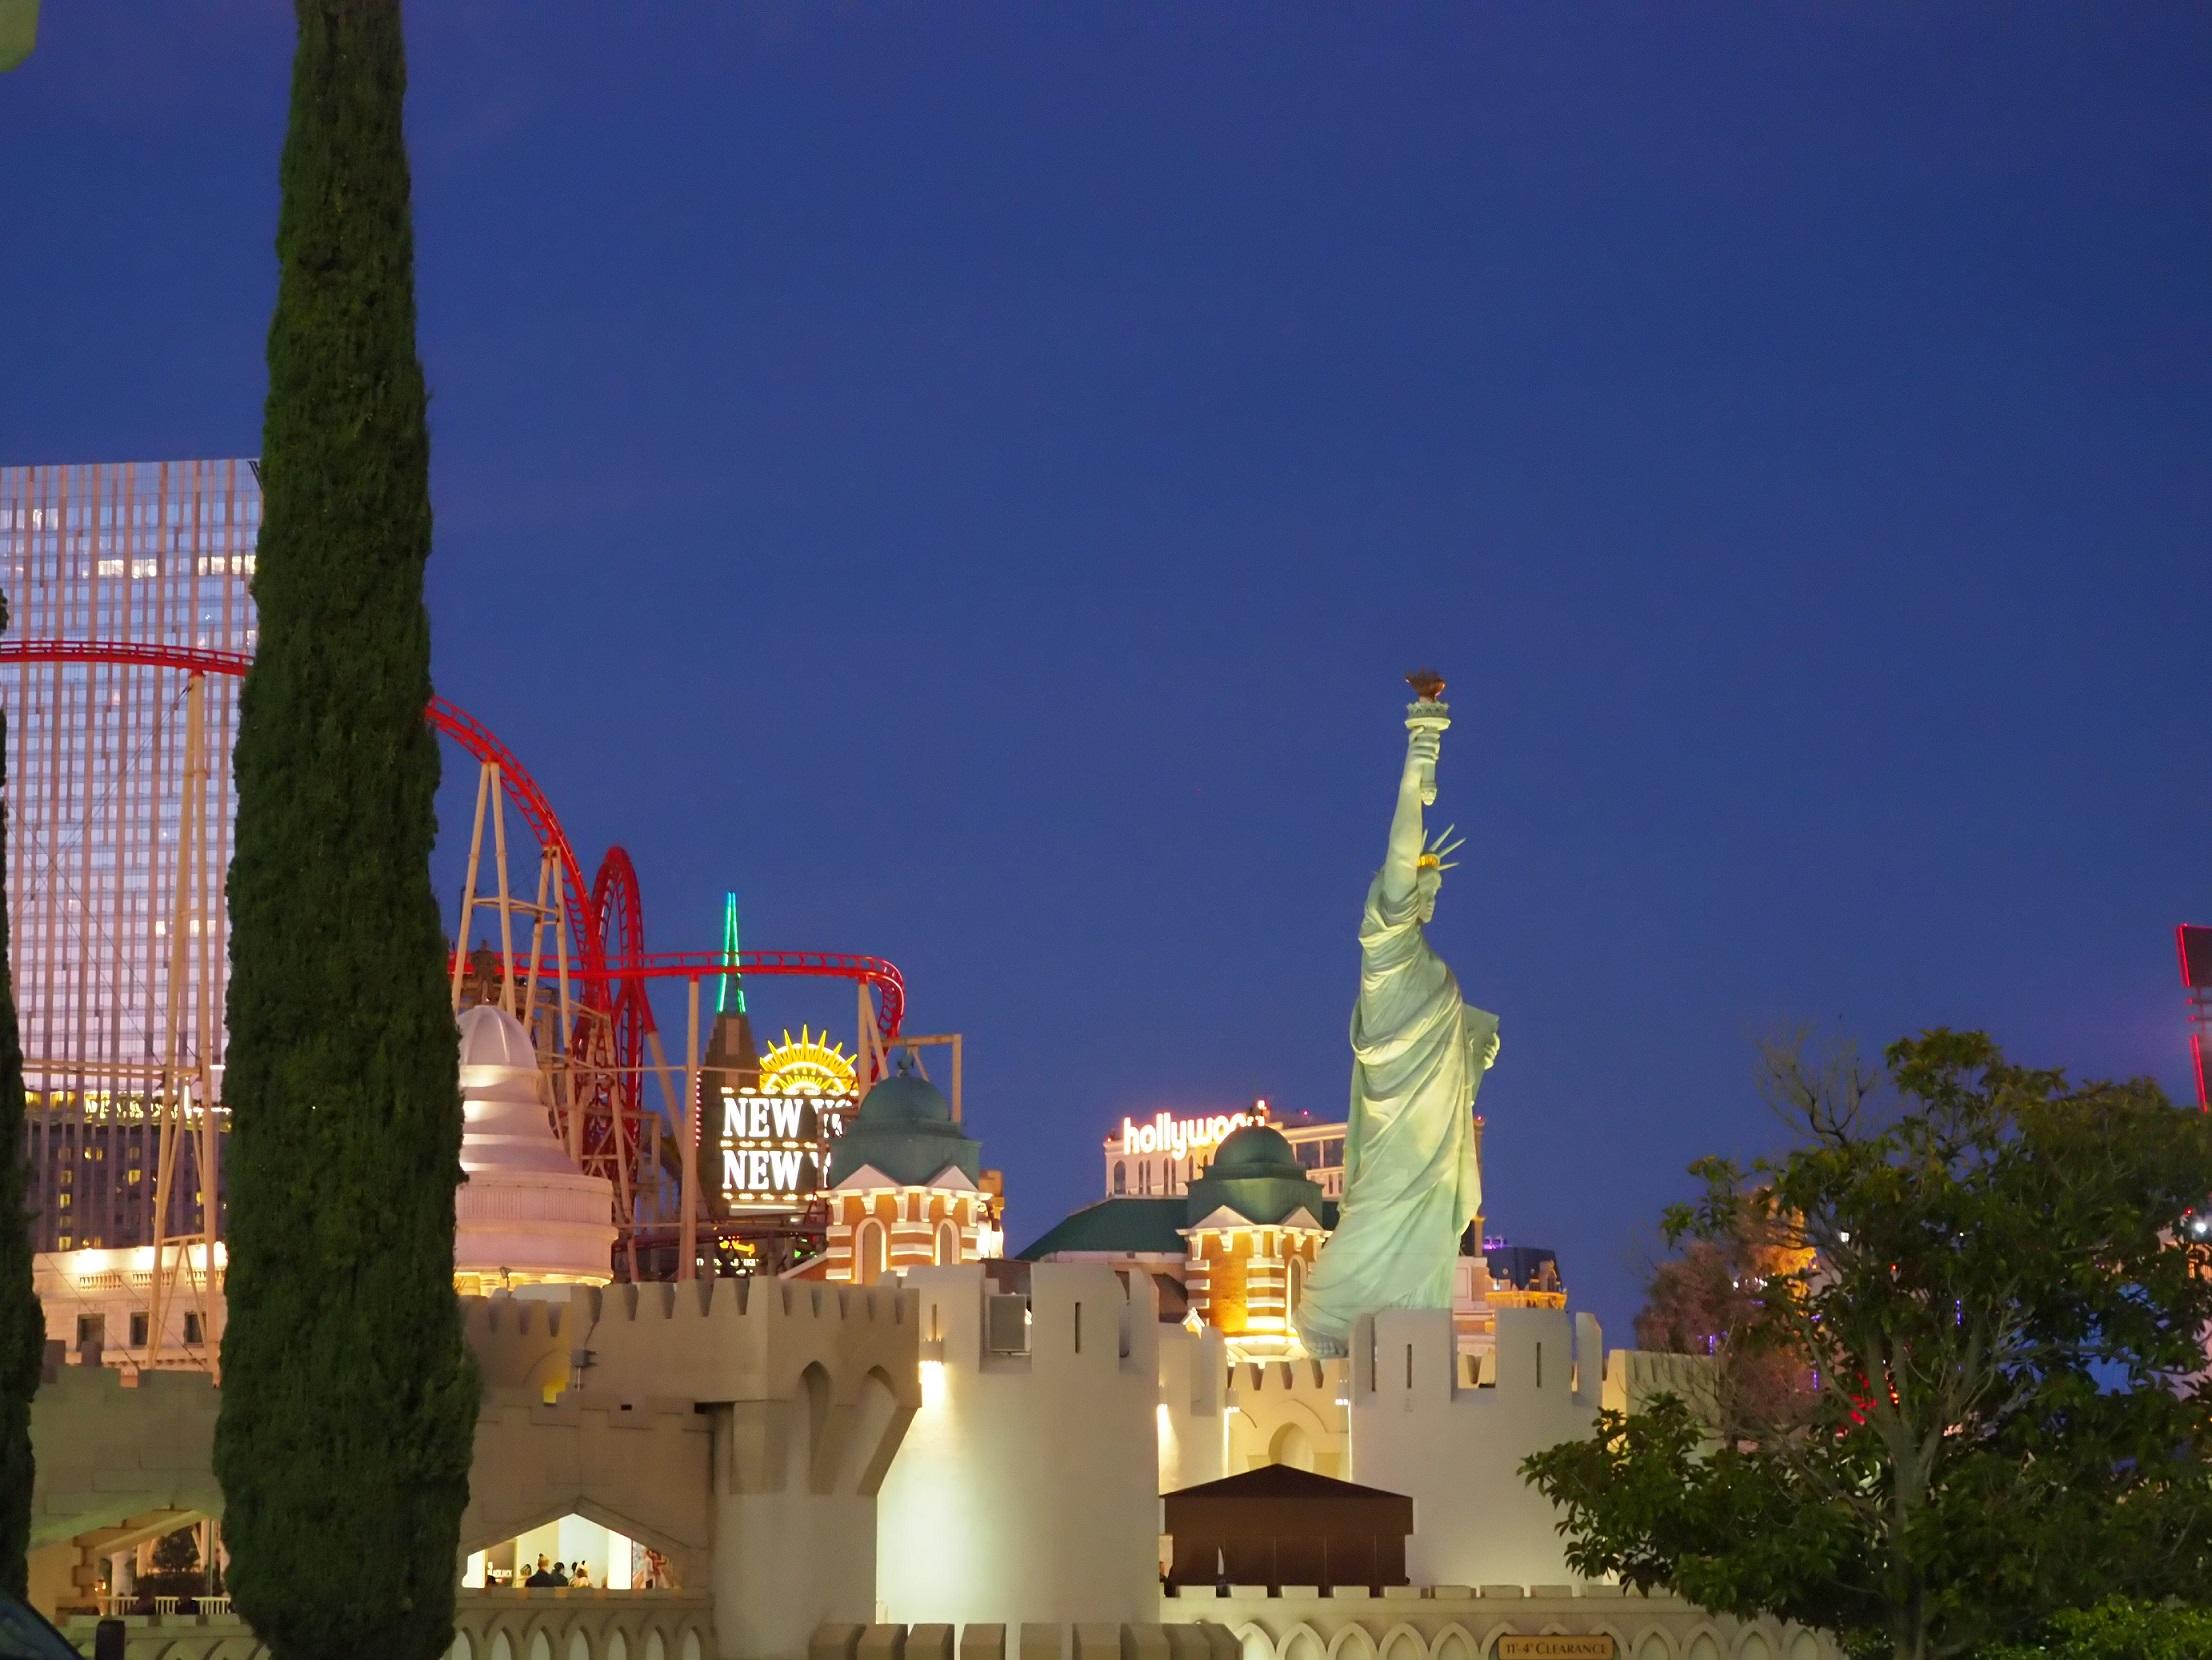 Casino New York New York à Las Vegas